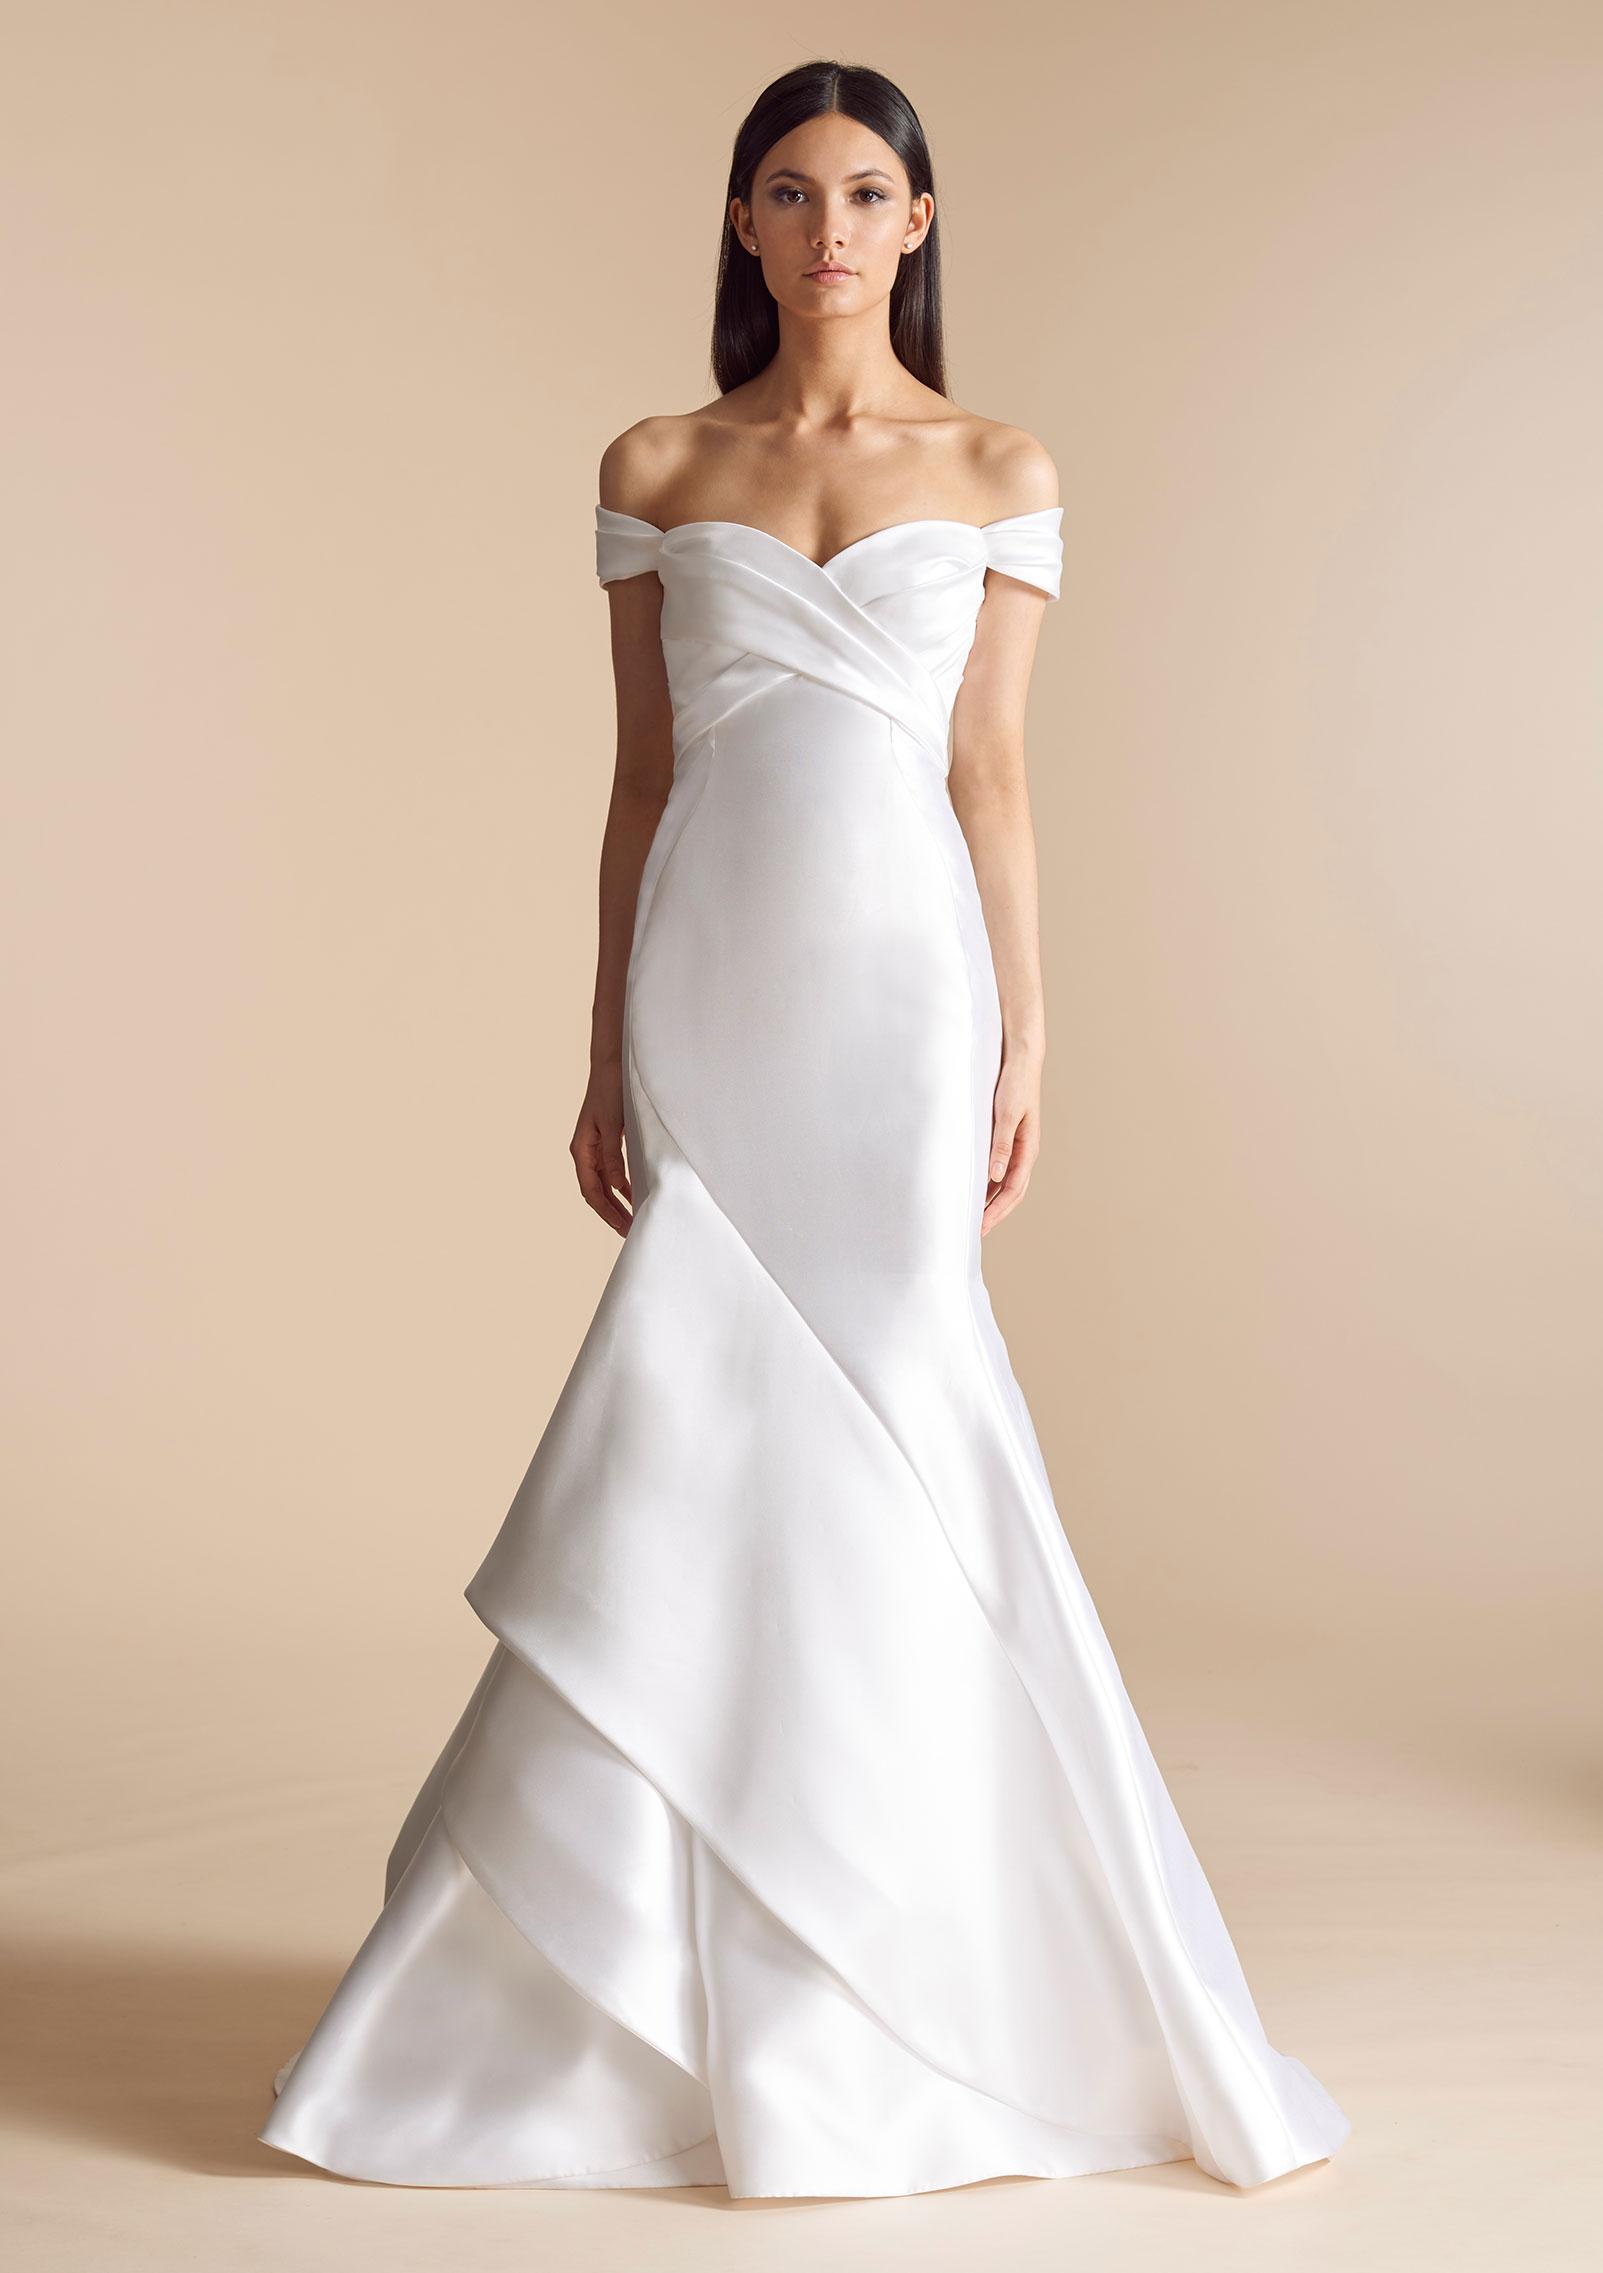 Royal wedding gown inspiration by Allison Webb Bridal